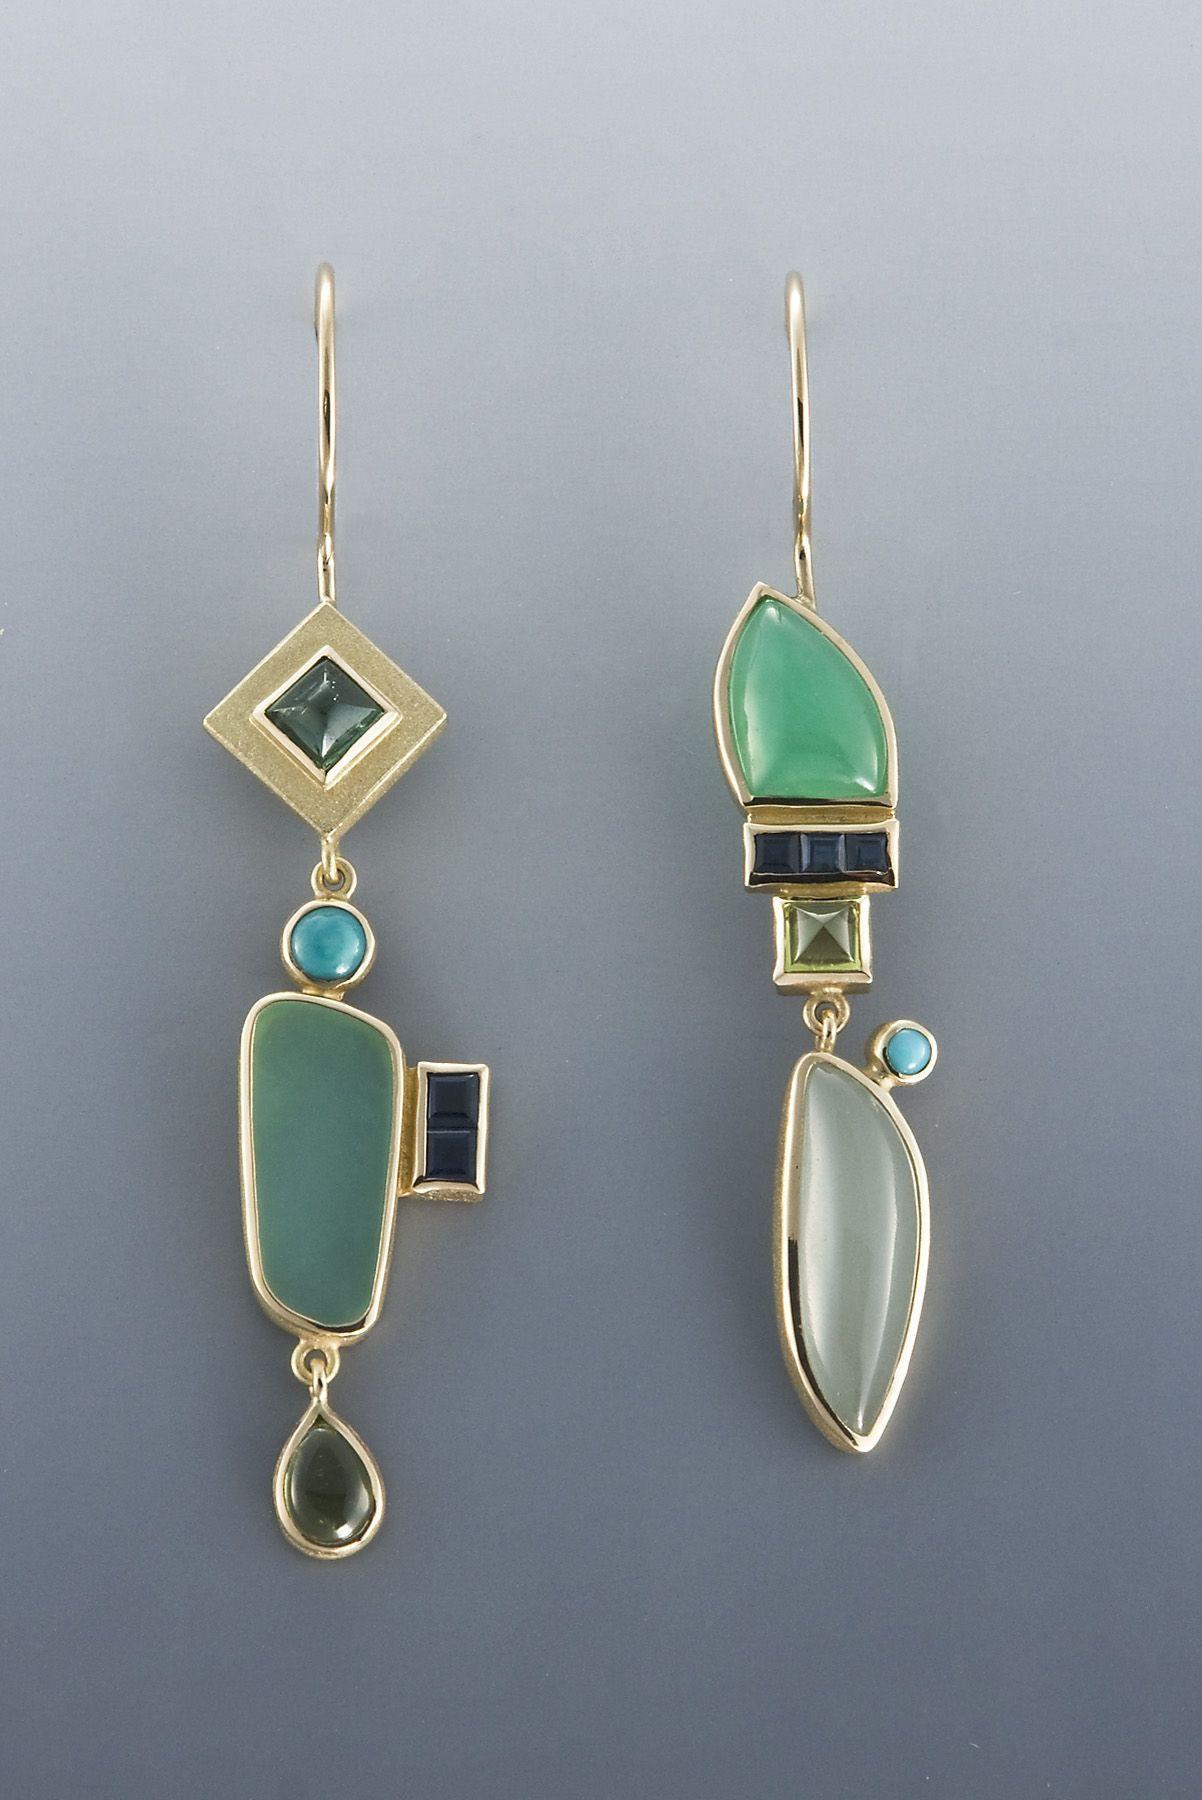 Elegant Asymmetrical Earrings, Jewelry design, Fashion accessory